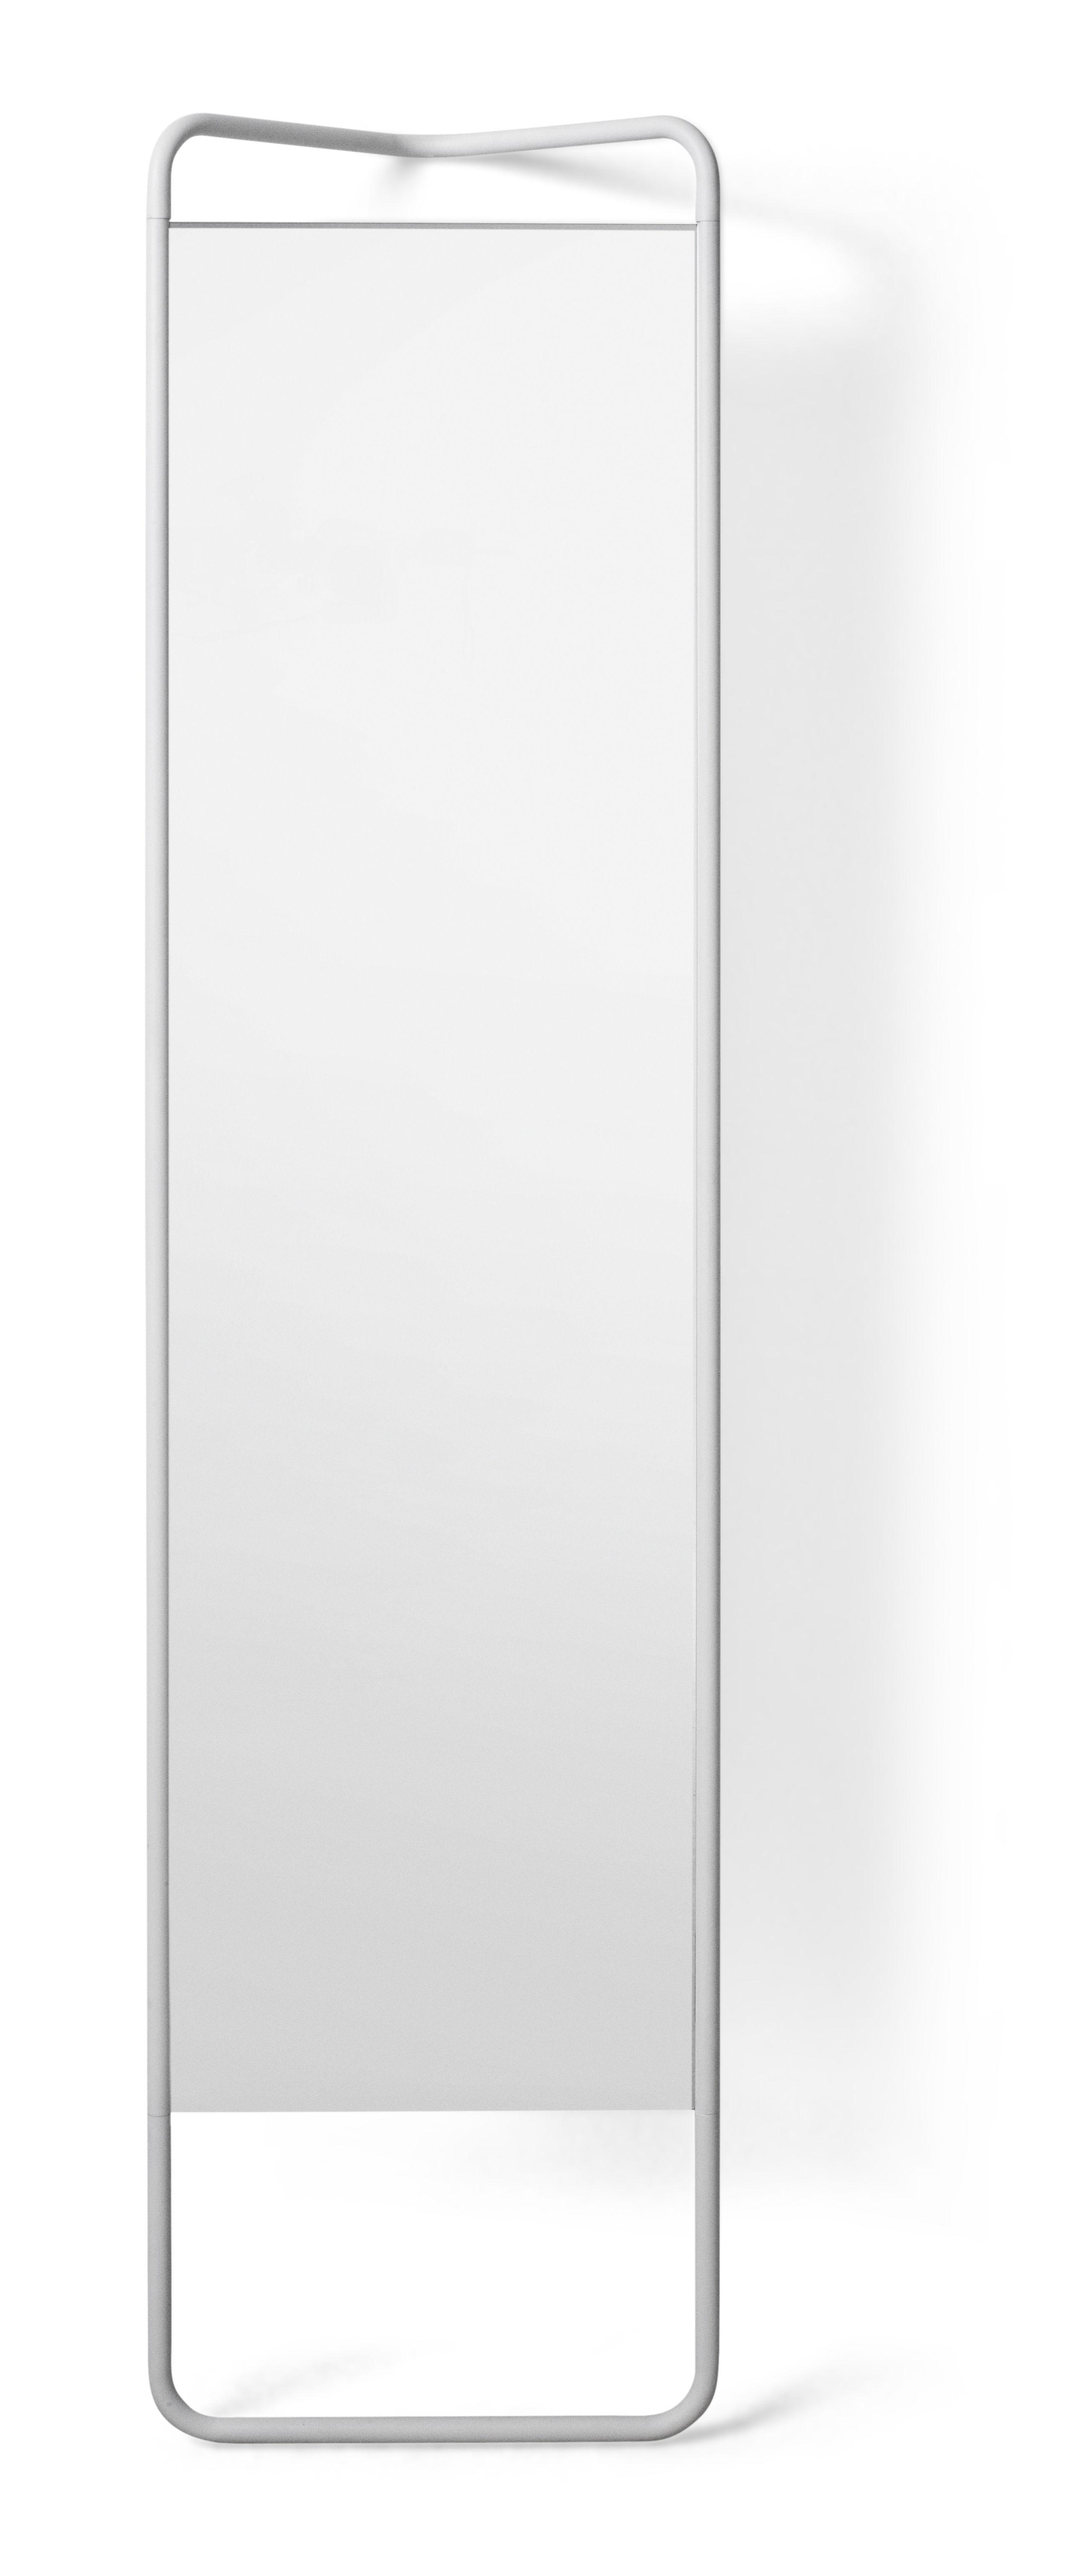 kaschkasch zum hinstellen l 42 cm x h 175 cm menu standspiegel. Black Bedroom Furniture Sets. Home Design Ideas